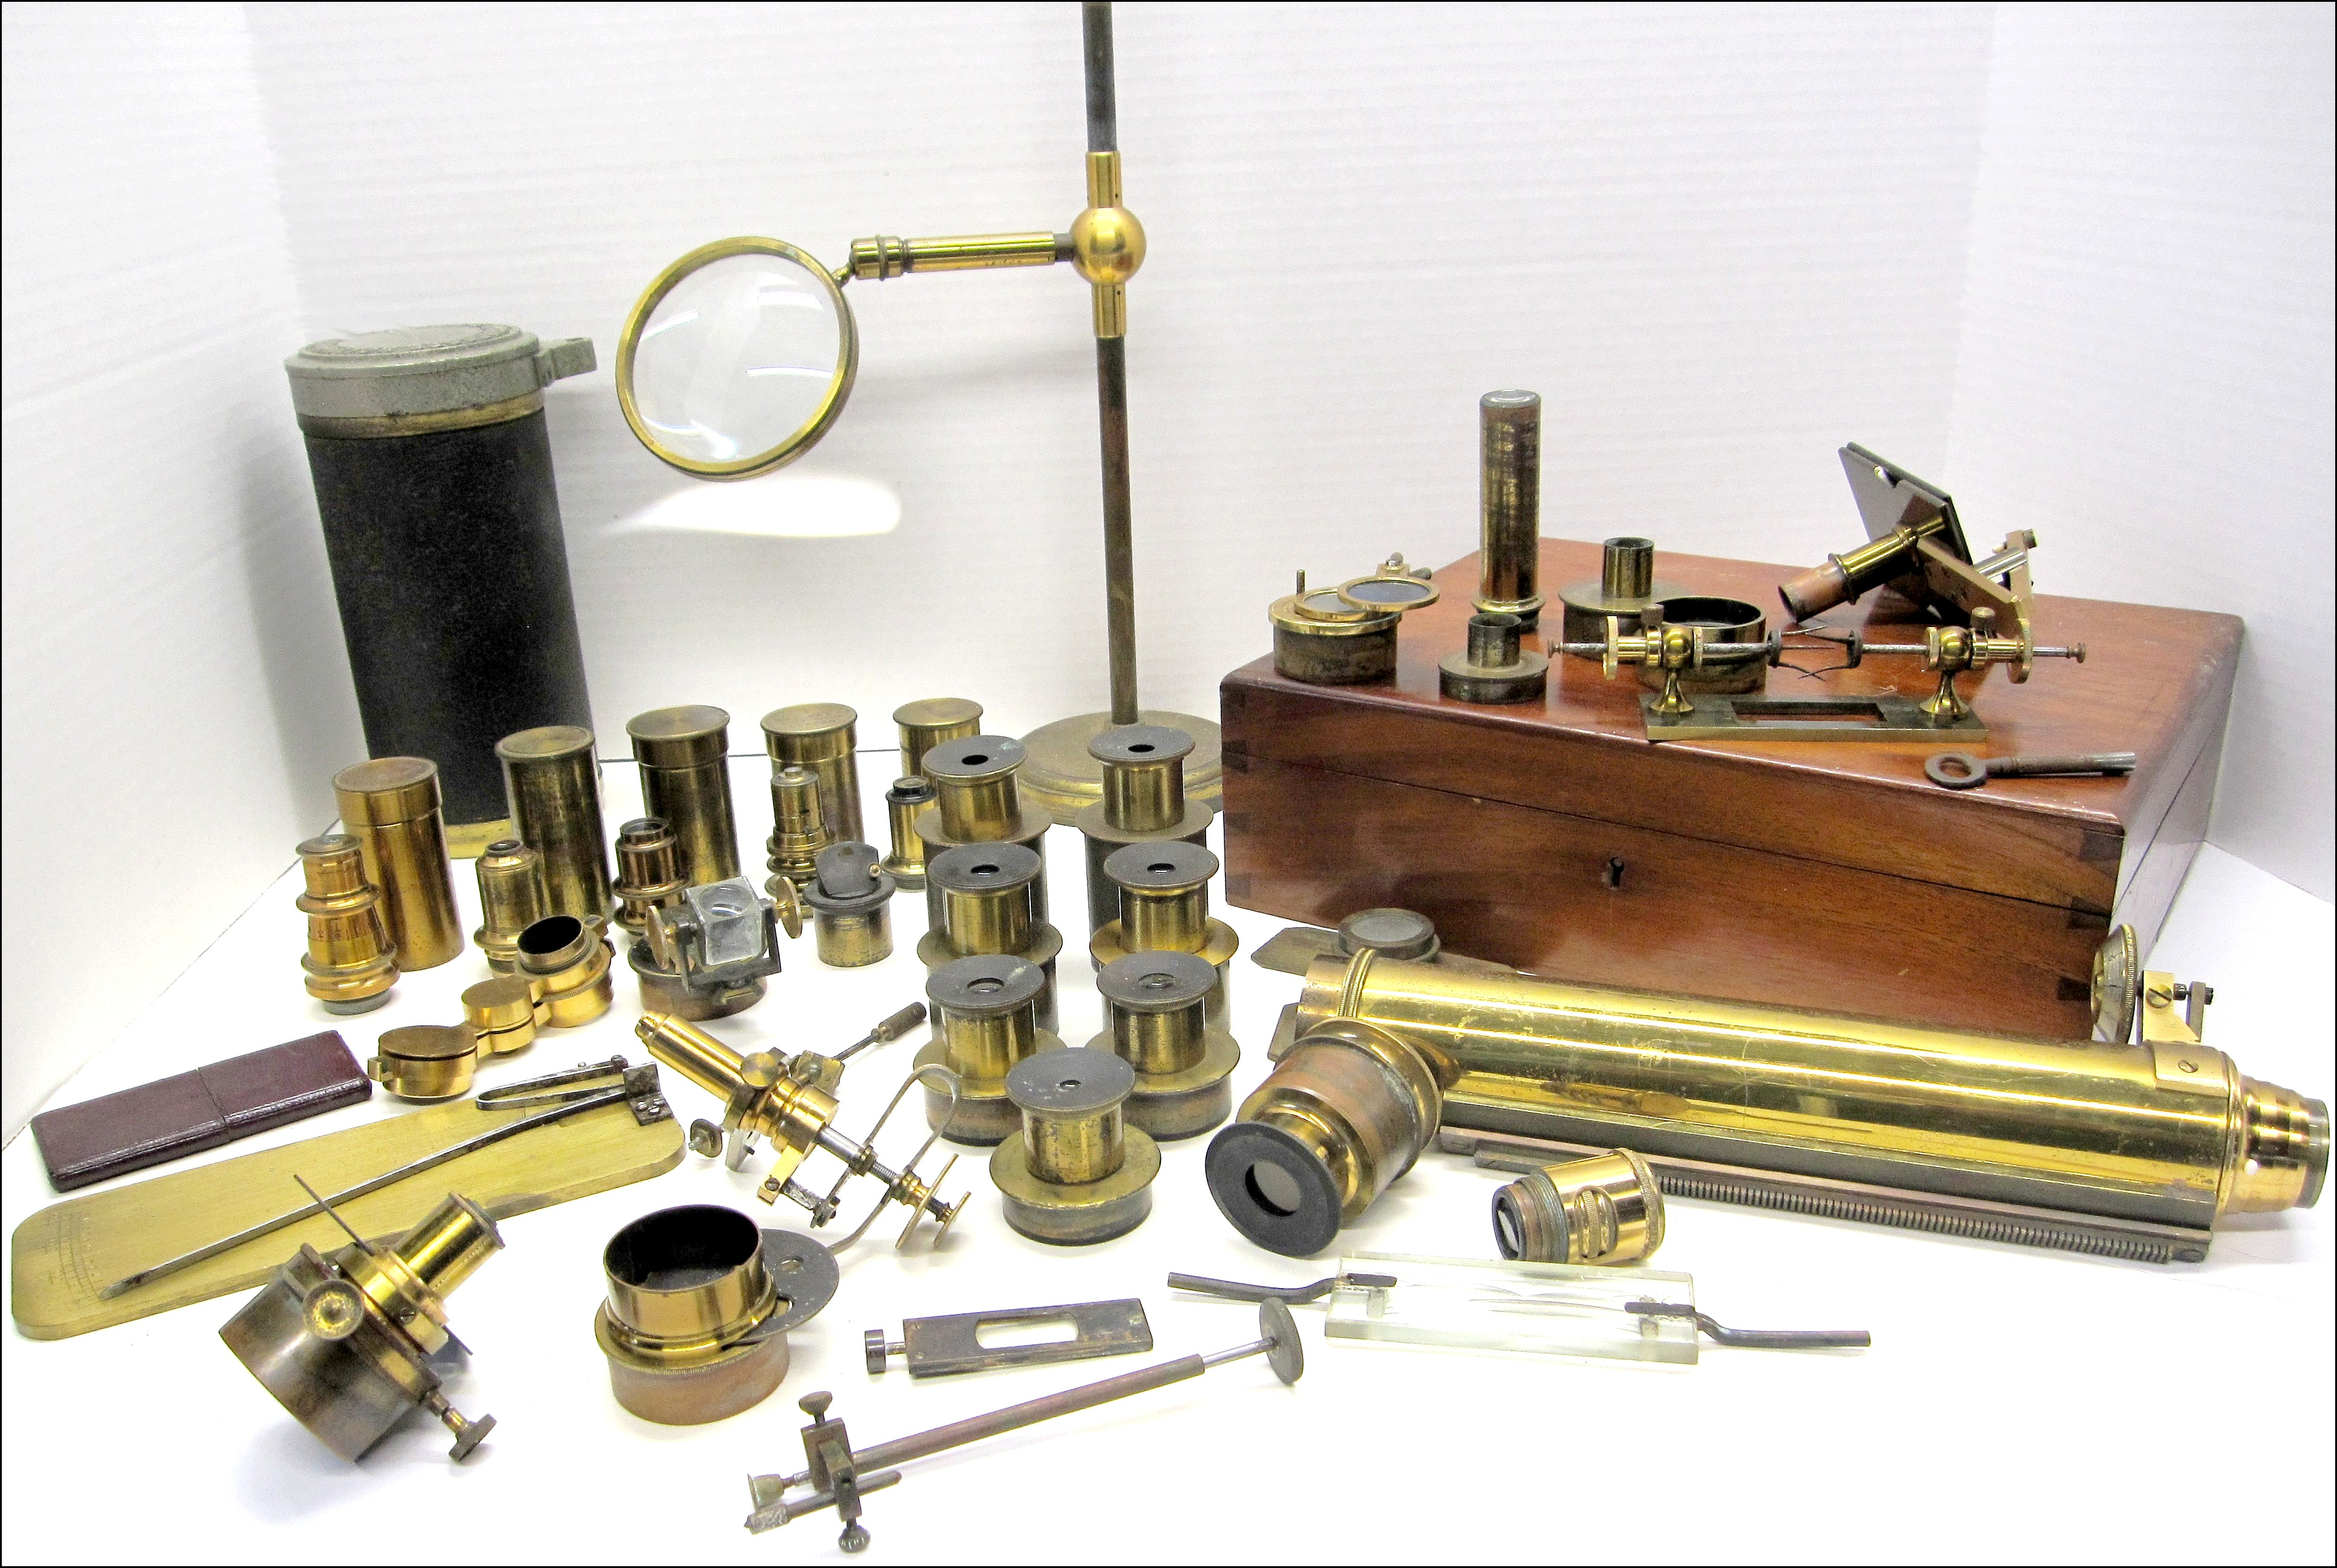 Zentmayer Grand American microscope binocular 1089 accessories